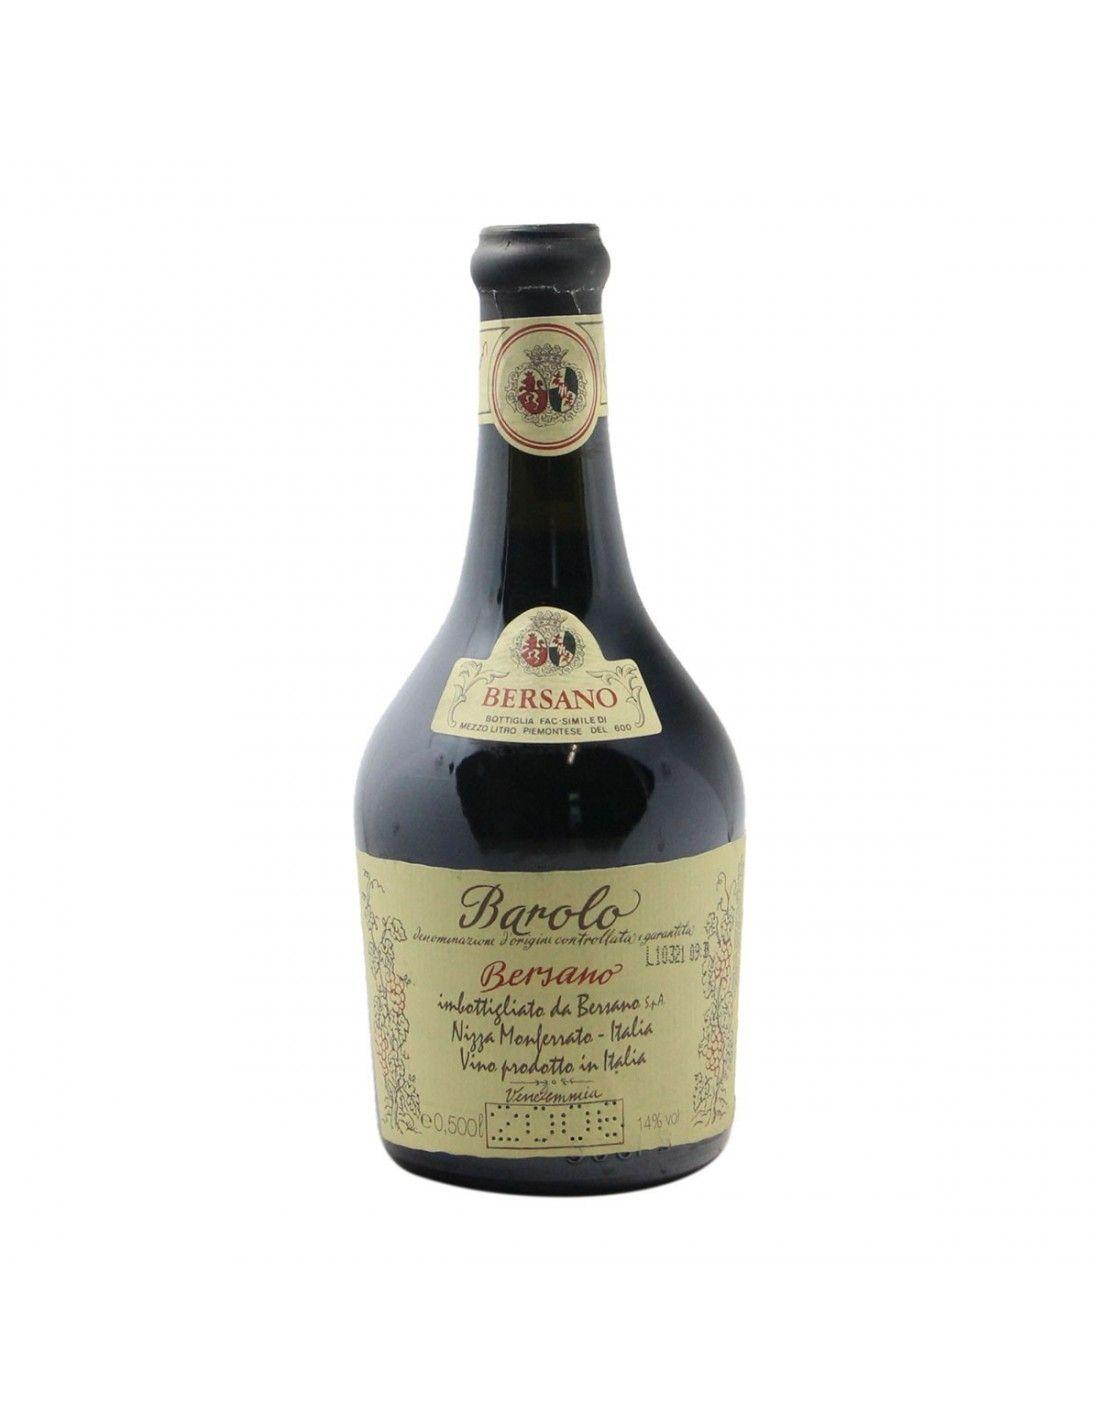 BAROLO 0.5 L 2006 BERSANO Grandi Bottiglie